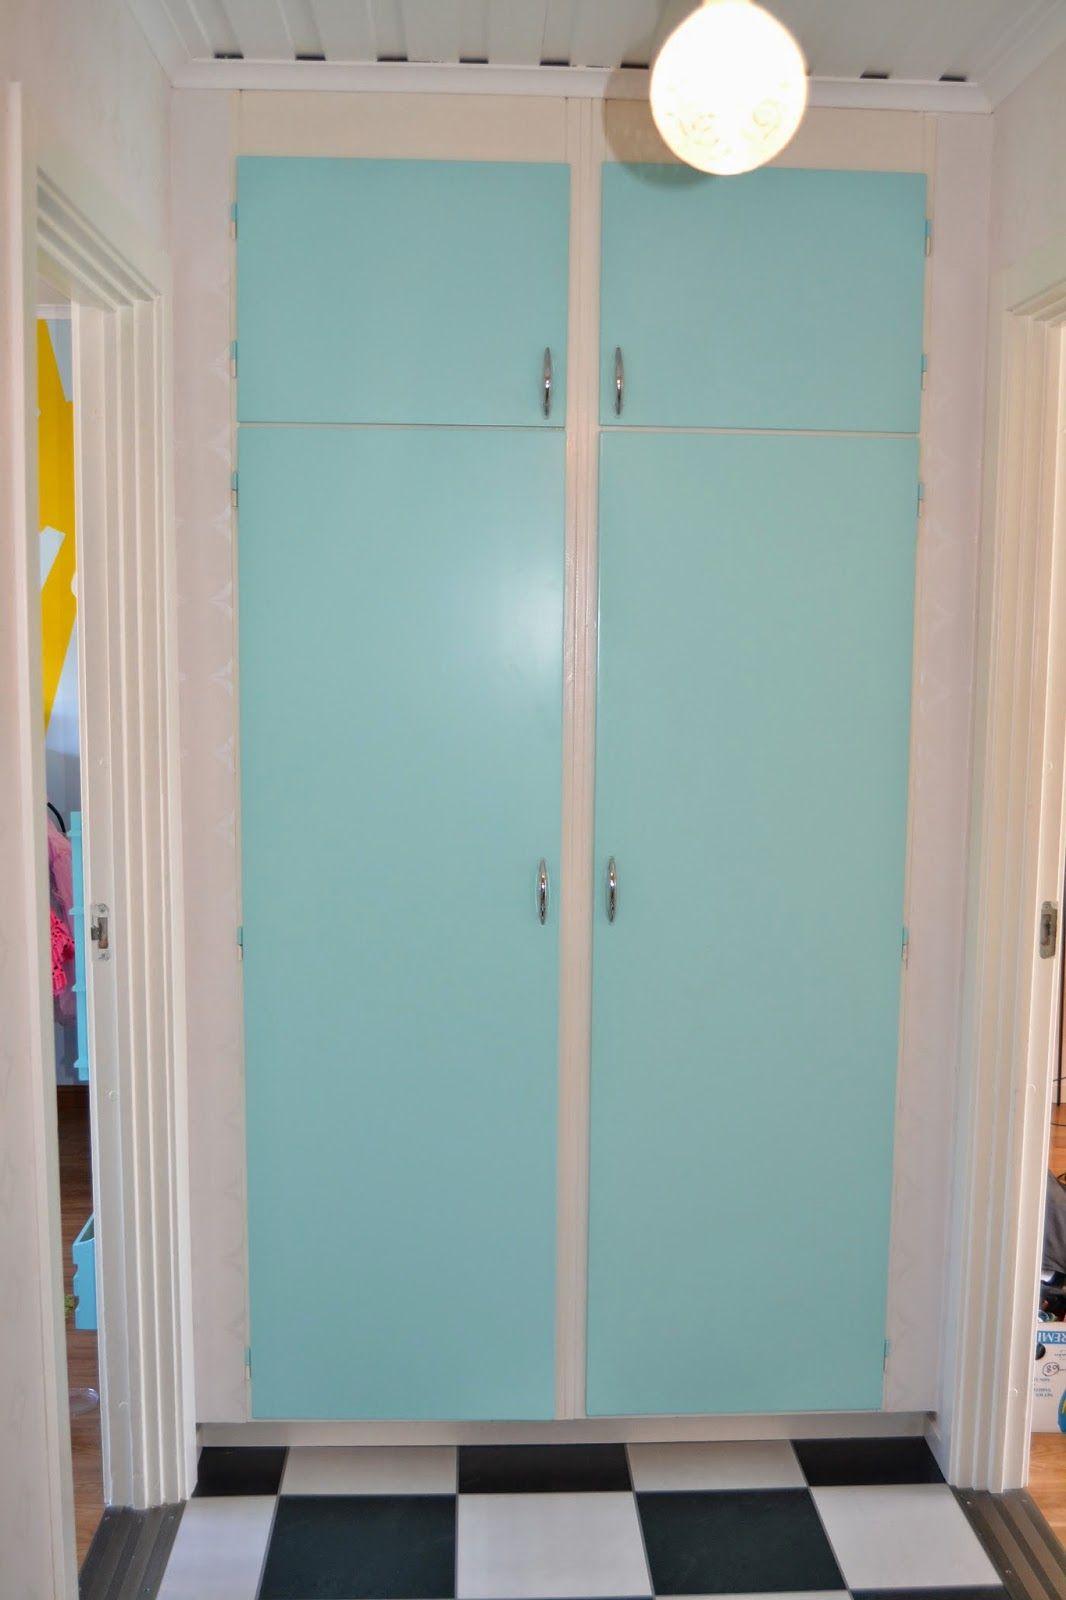 Garderob garderobsdörrar 60 cm : färgglada garderobsdörrar   Turqouise   Pinterest